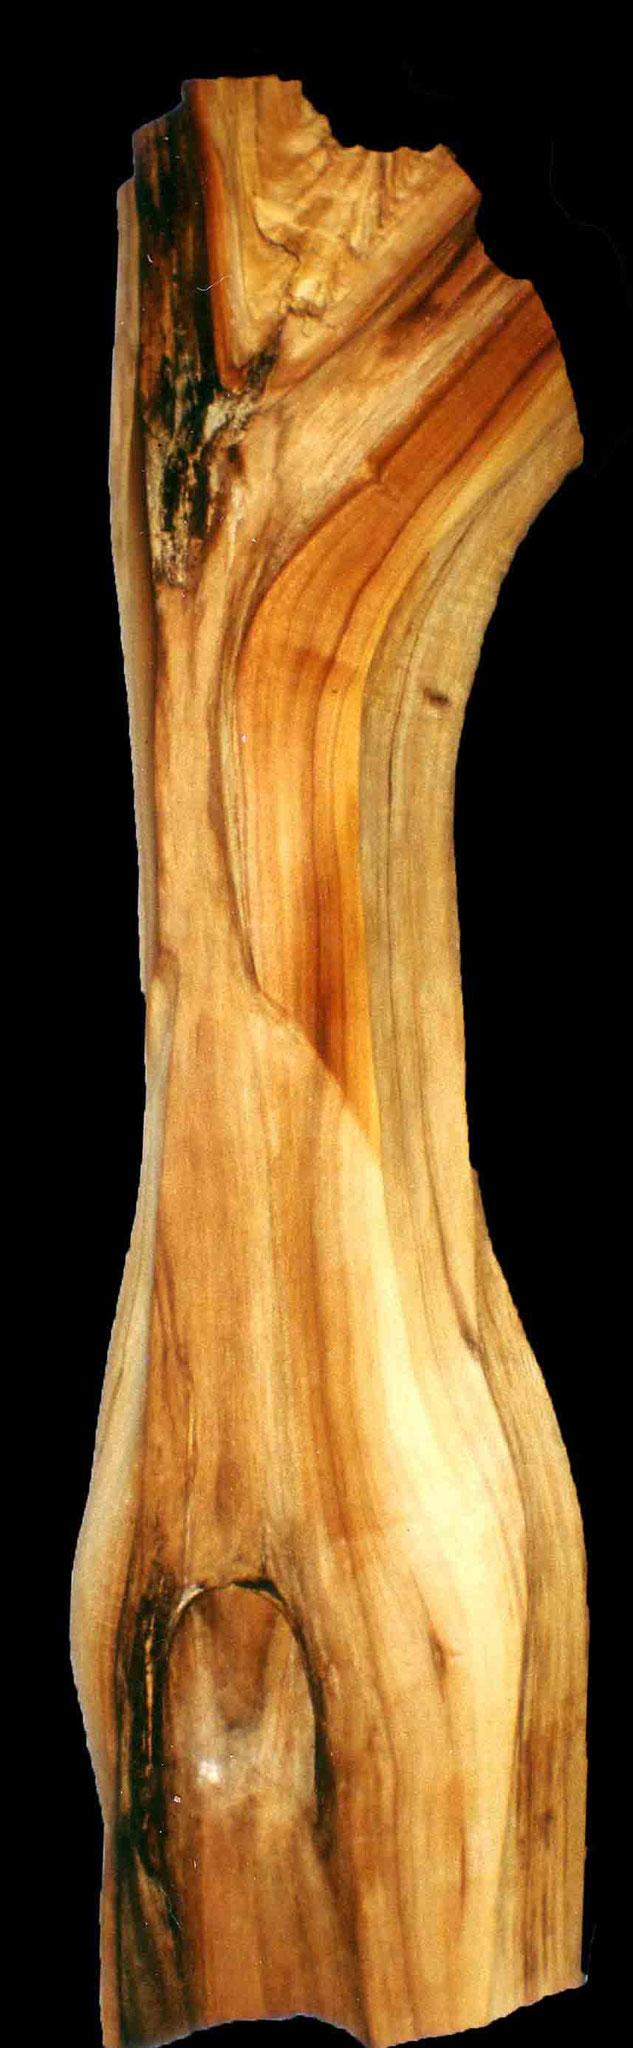 Torso, Apfelbaum  75 cm.